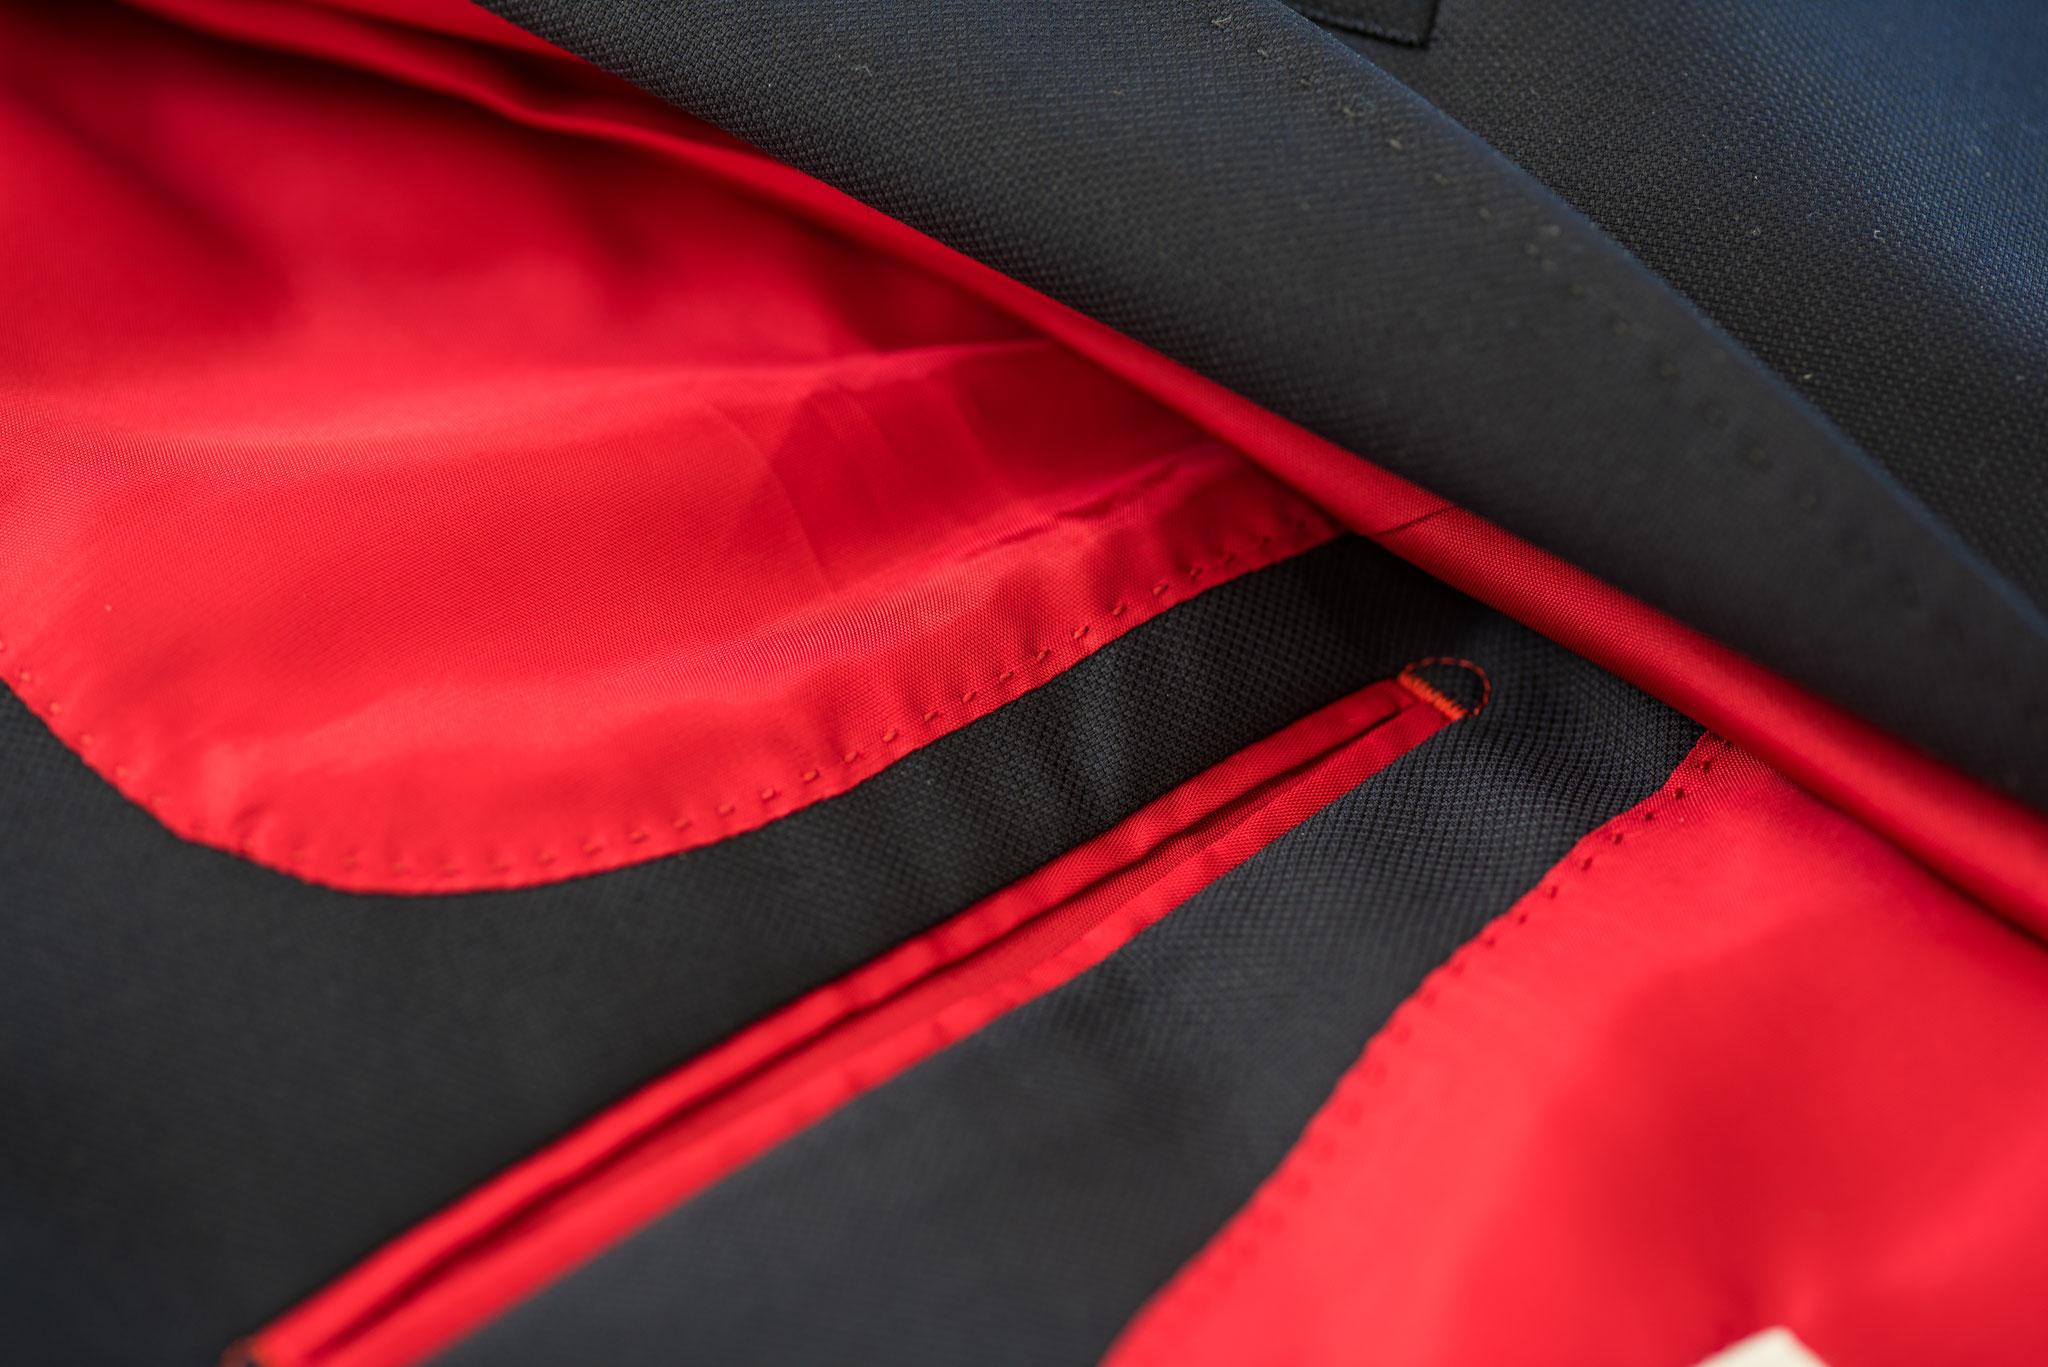 Rotes Kontrastfutter in strukturiertem dunkelblauem Herrensakko